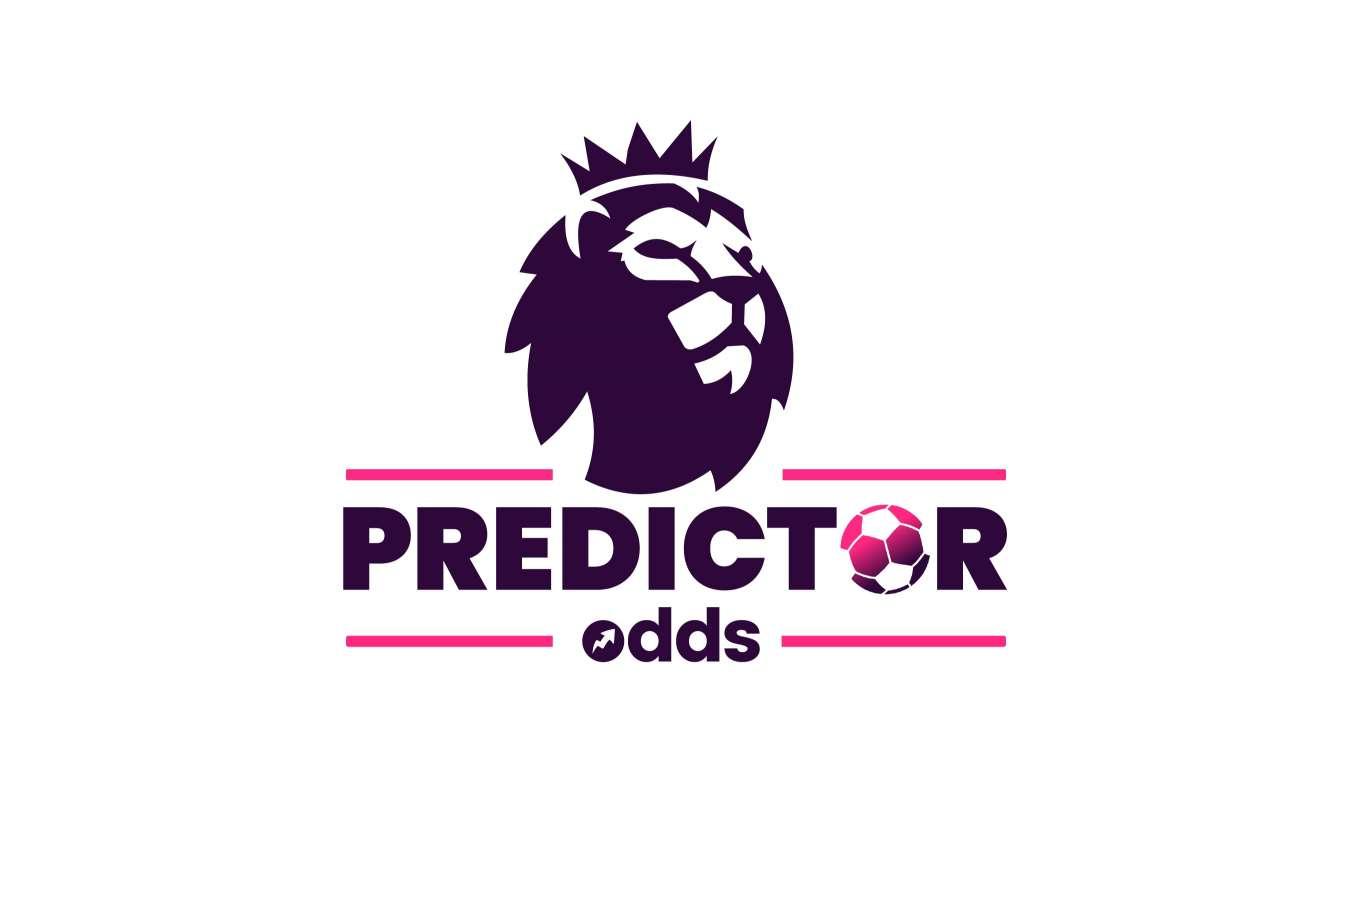 Epl betting tips and predictions for tomorrow betting bangarraju heroine sheiks